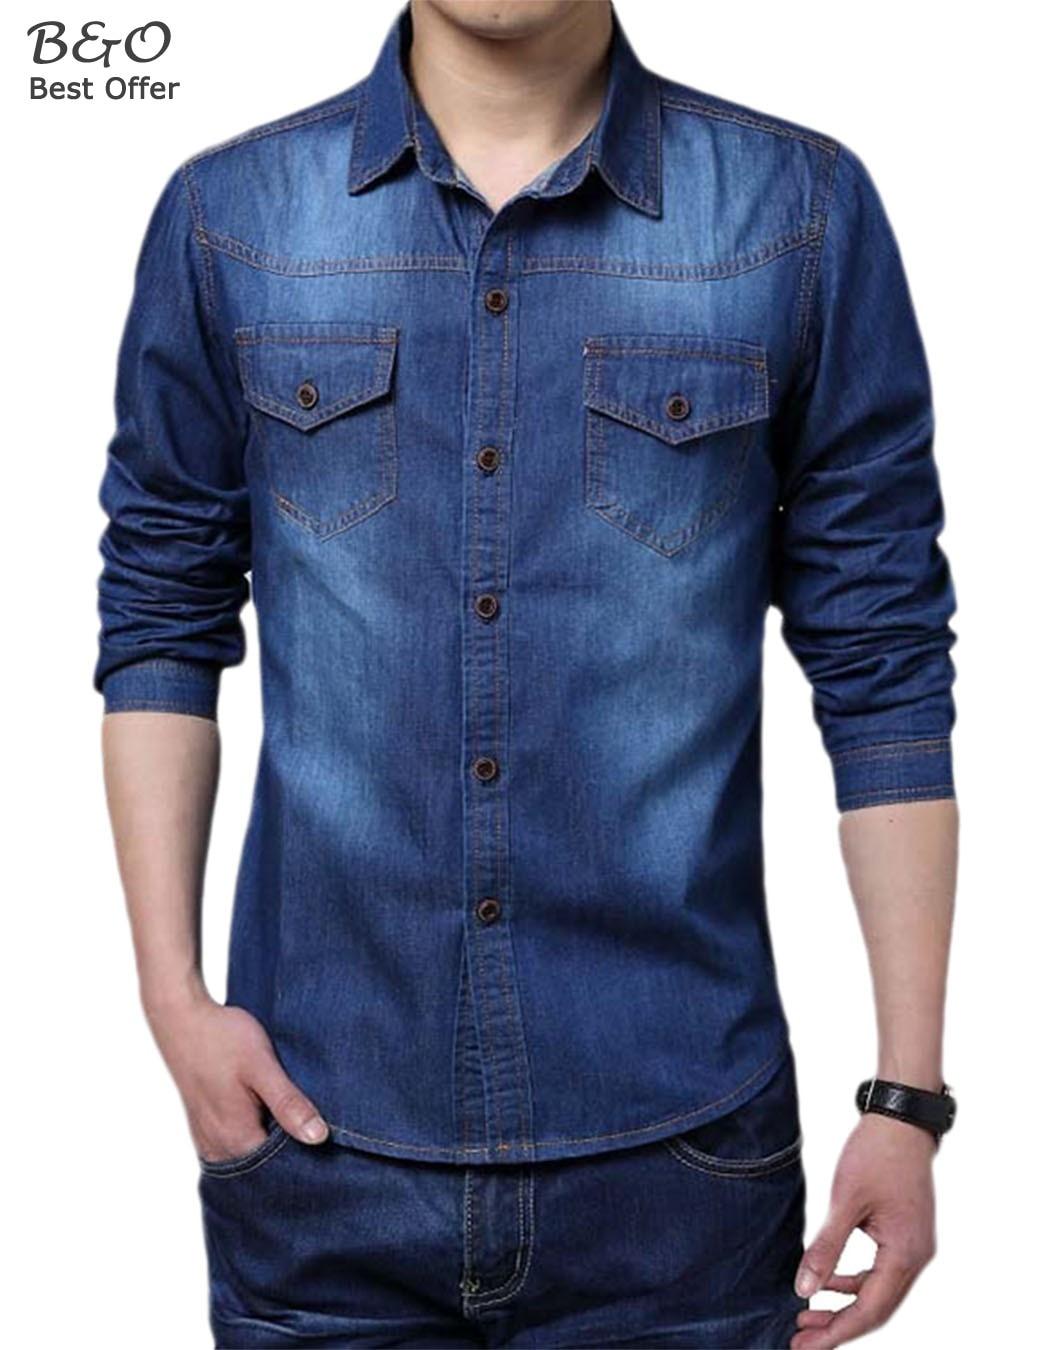 Buy jeans shirts men autumn blouse 2016 for Buy denim shirts online